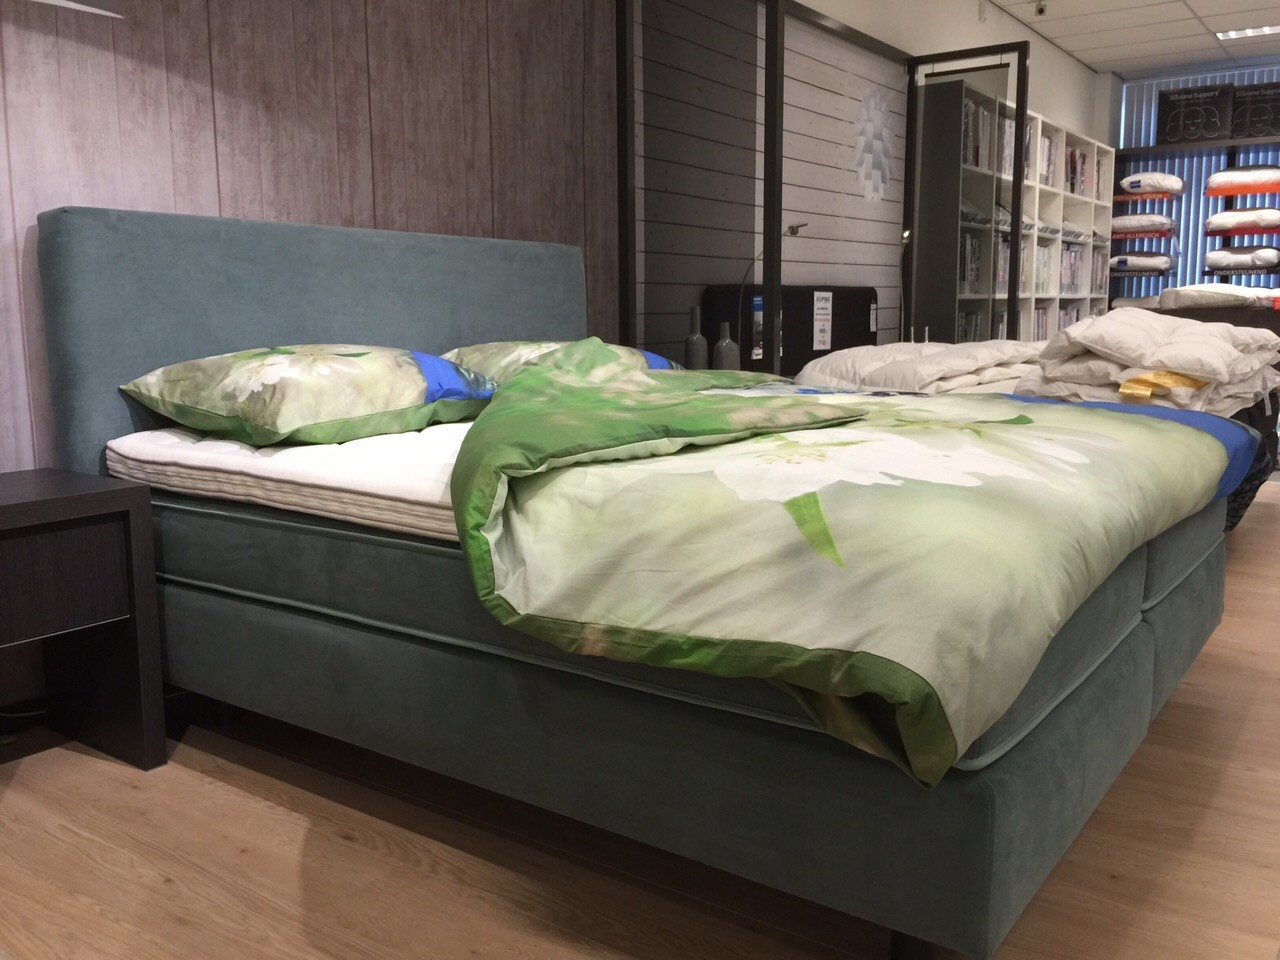 Auping bedden auping boxsprings gratis thuisbezorgd regio den haag haags beddenbedrijf - Groen hoofdbord ...